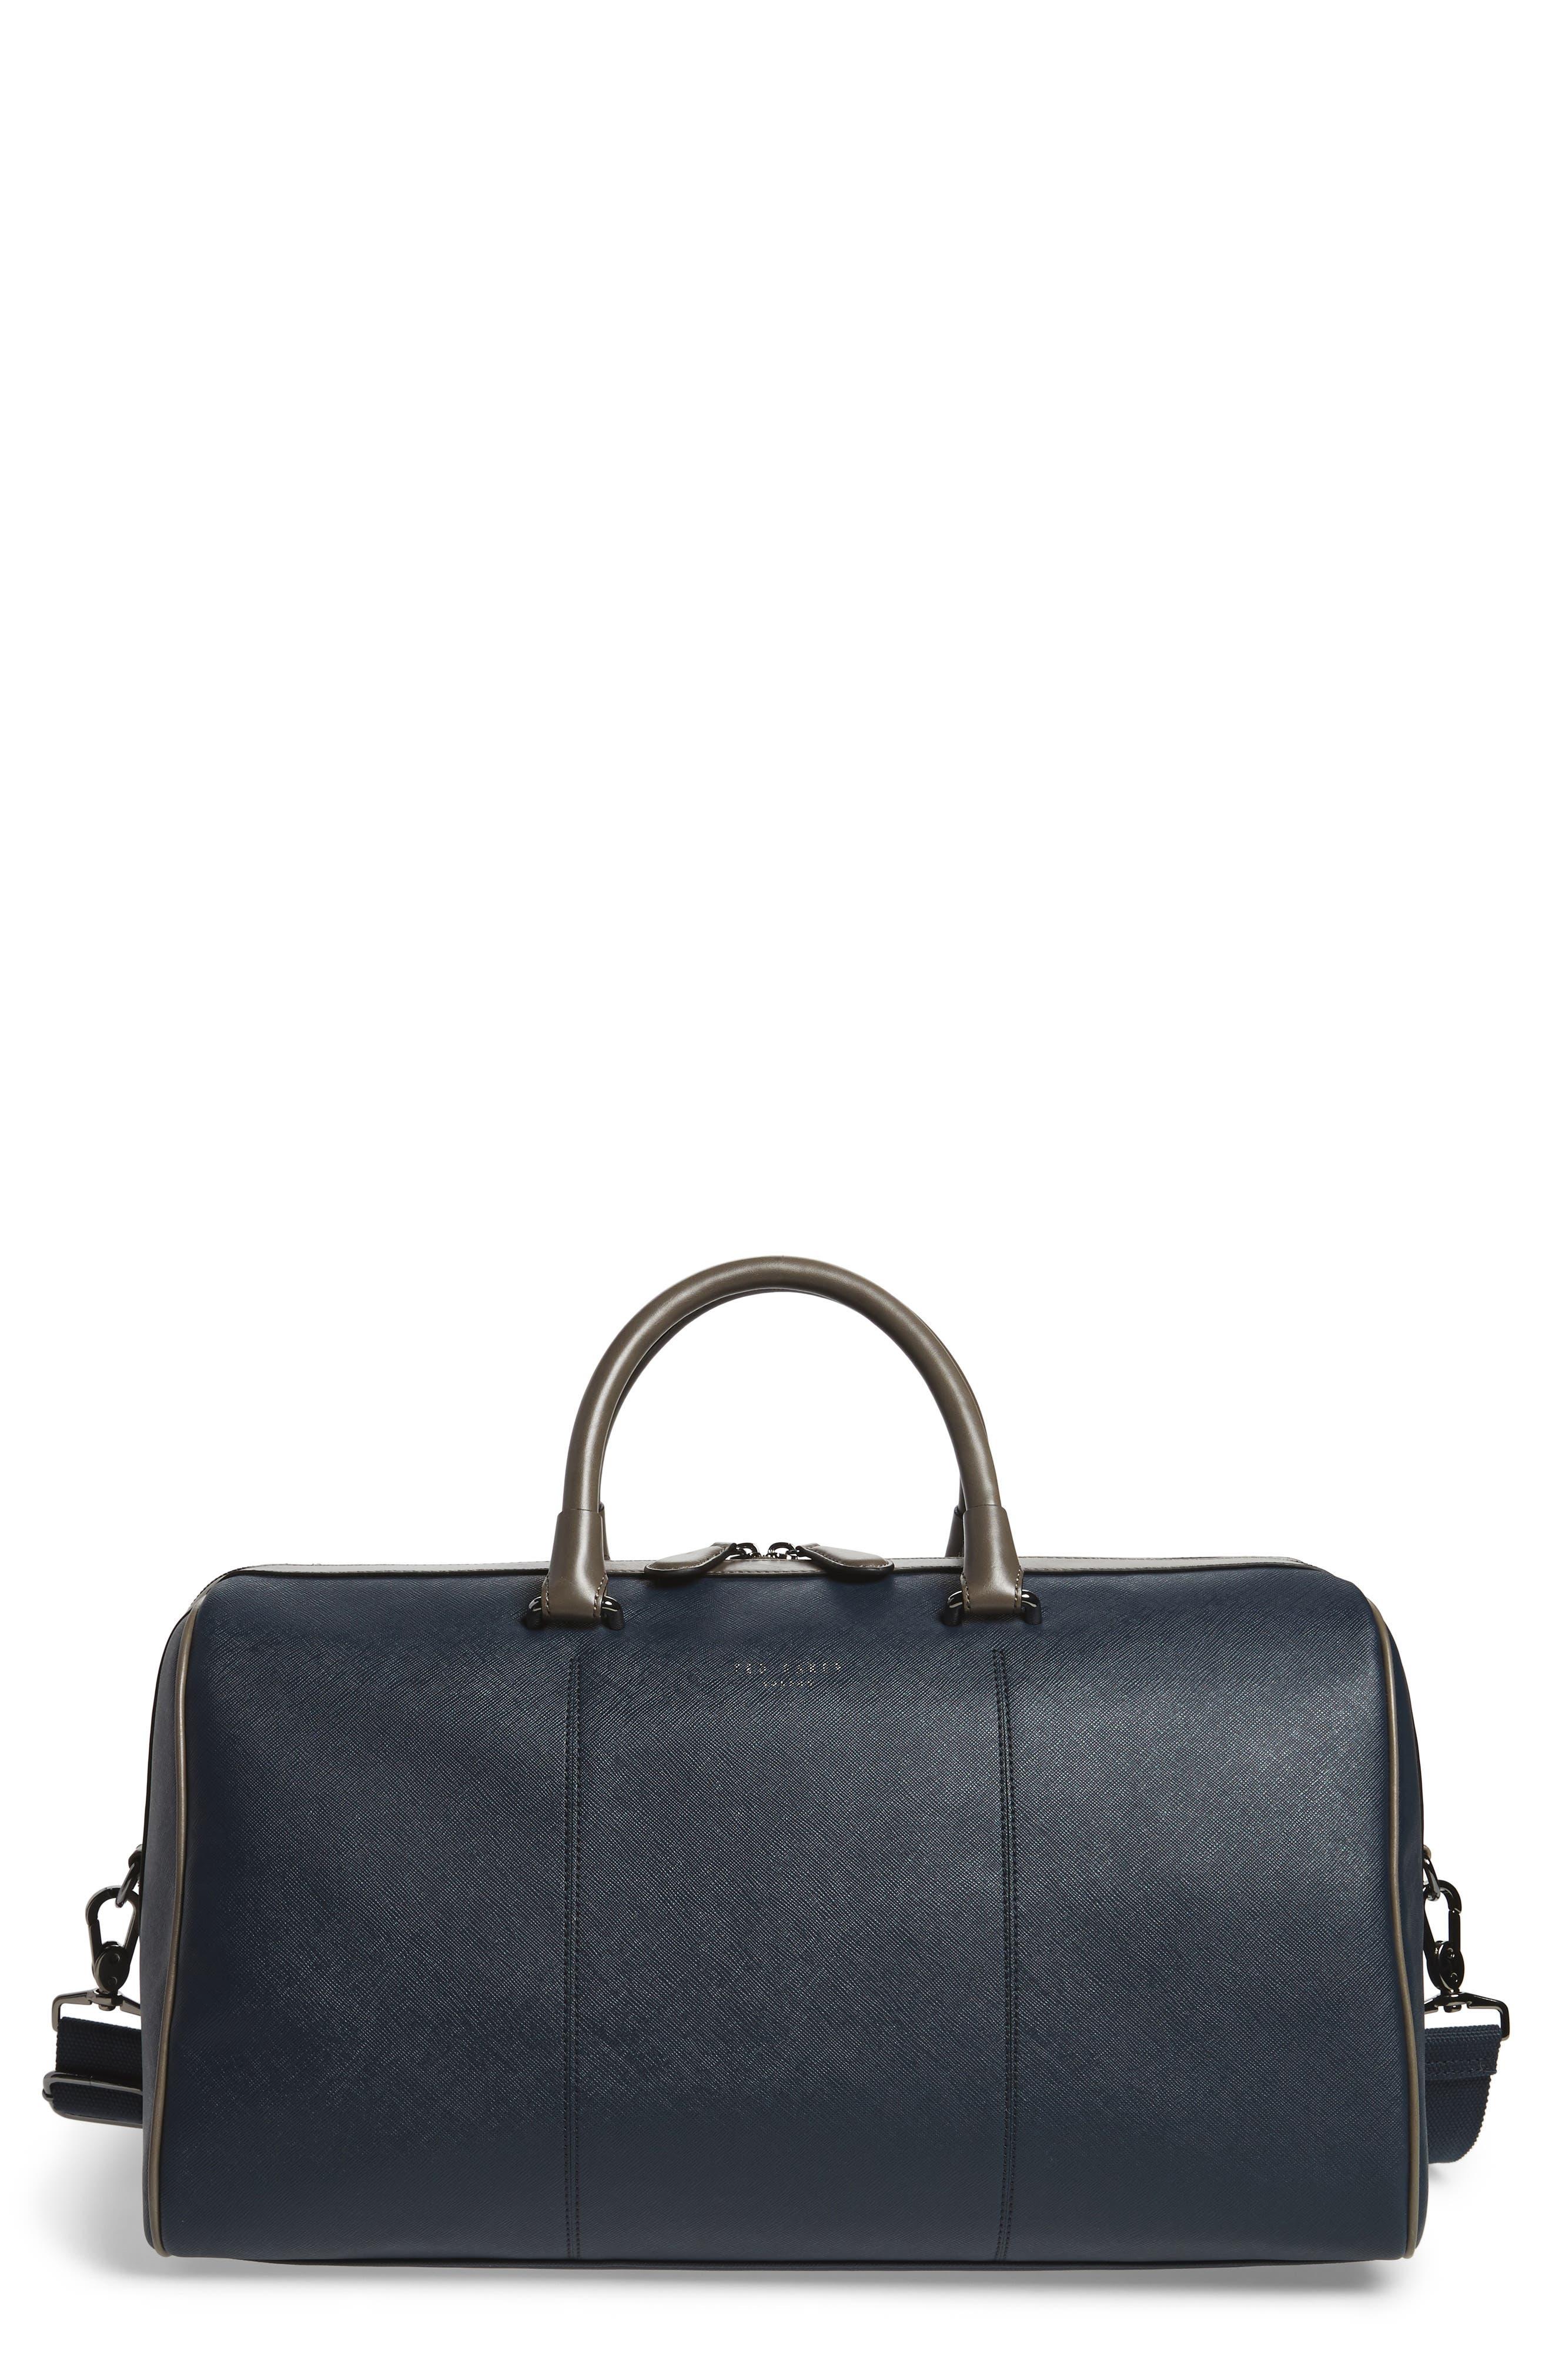 Ted Baker London Haybail Crossgrain Holdall Duffel Bag